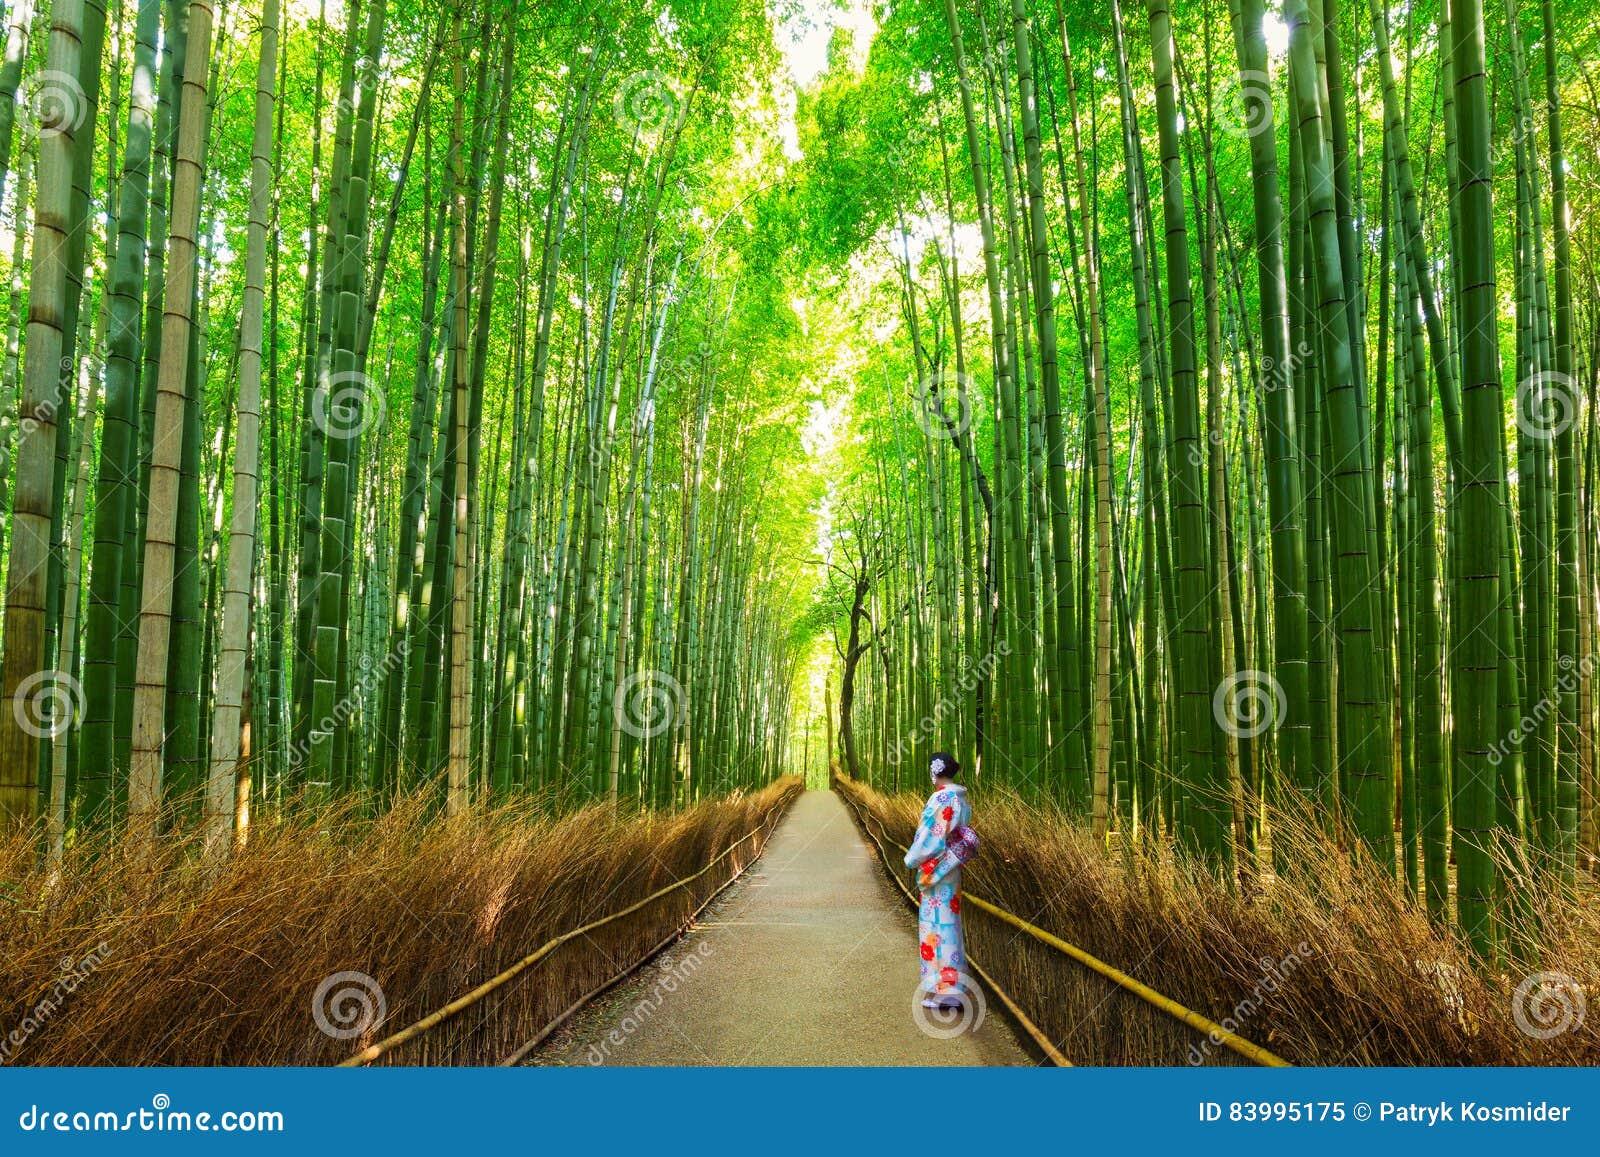 Forêt en bambou d Arashiyama près de Kyoto, Japon